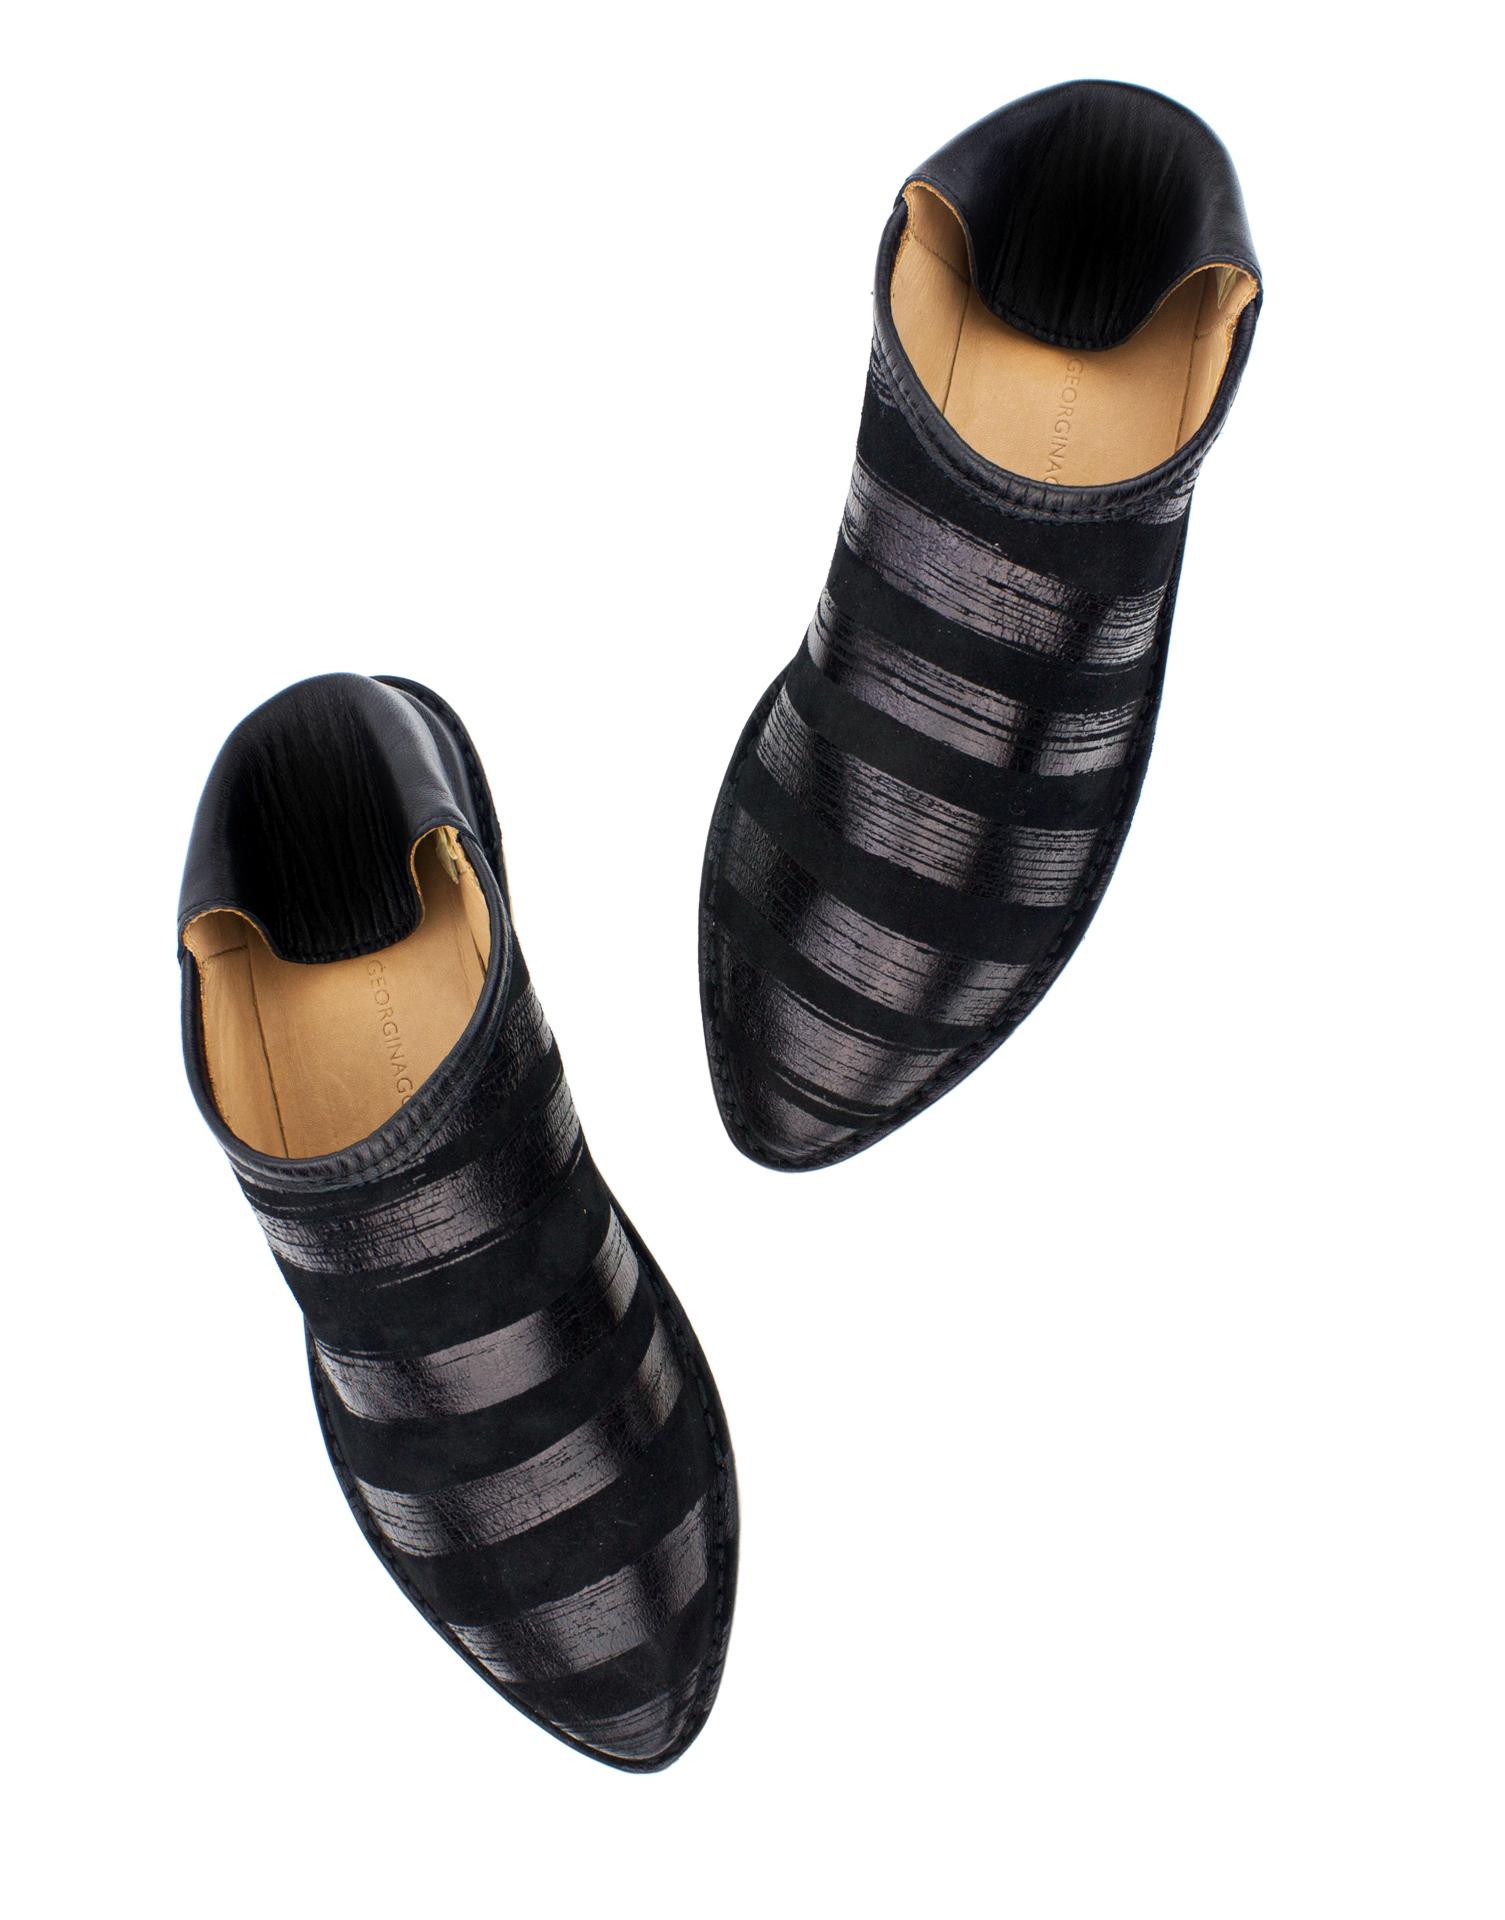 Georgina Goodman - Black & Black Striped Slipper